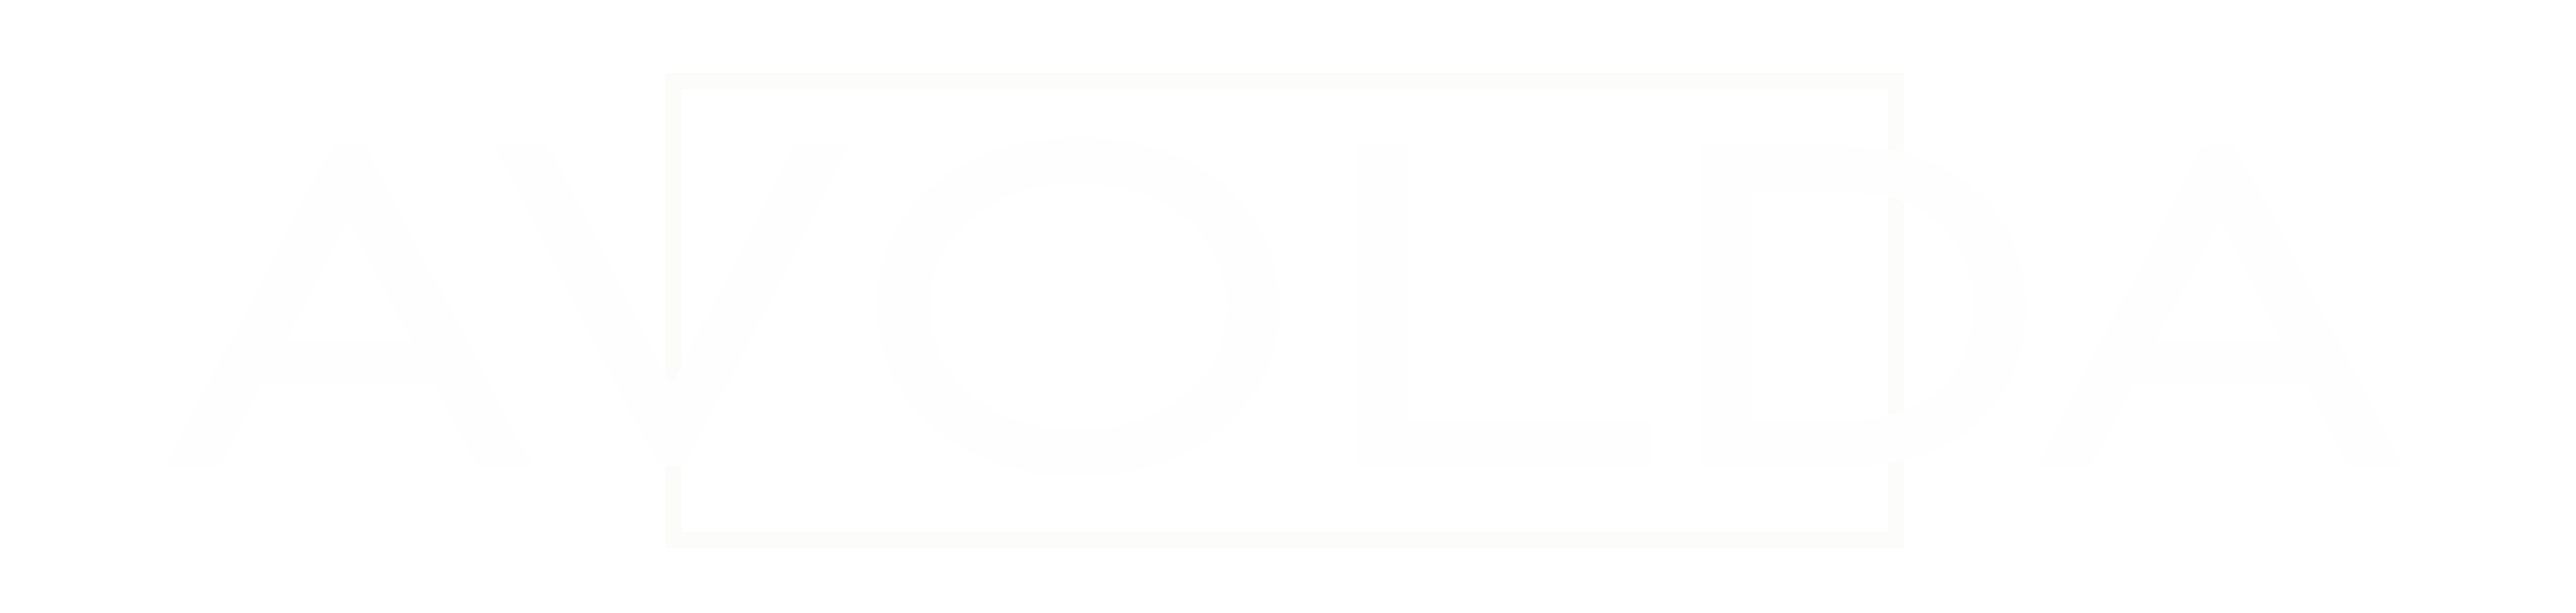 AVOLDA